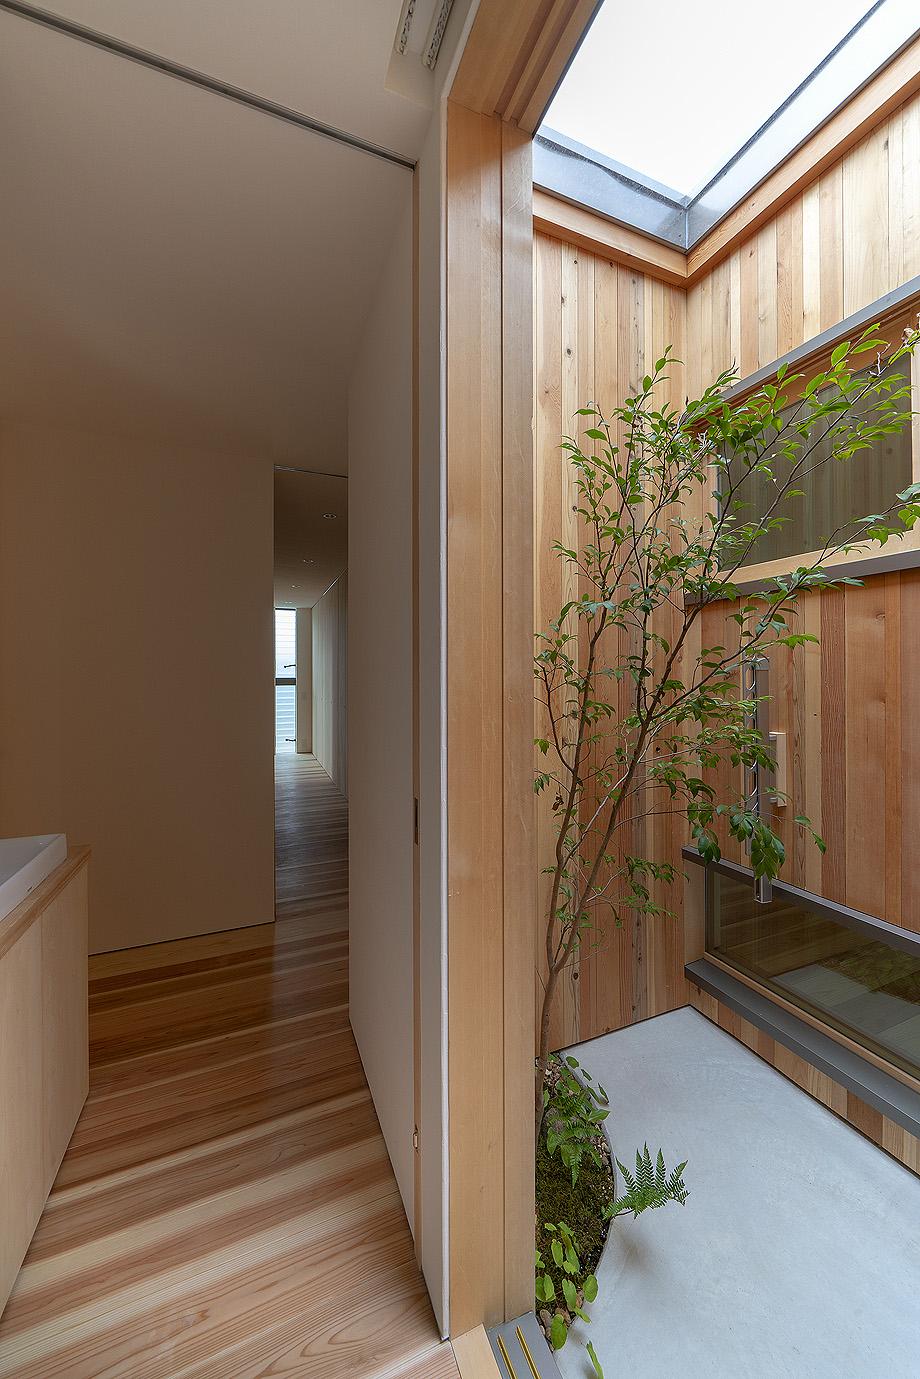 casa en akashi de arbol - foto yasunori shimomura (15)